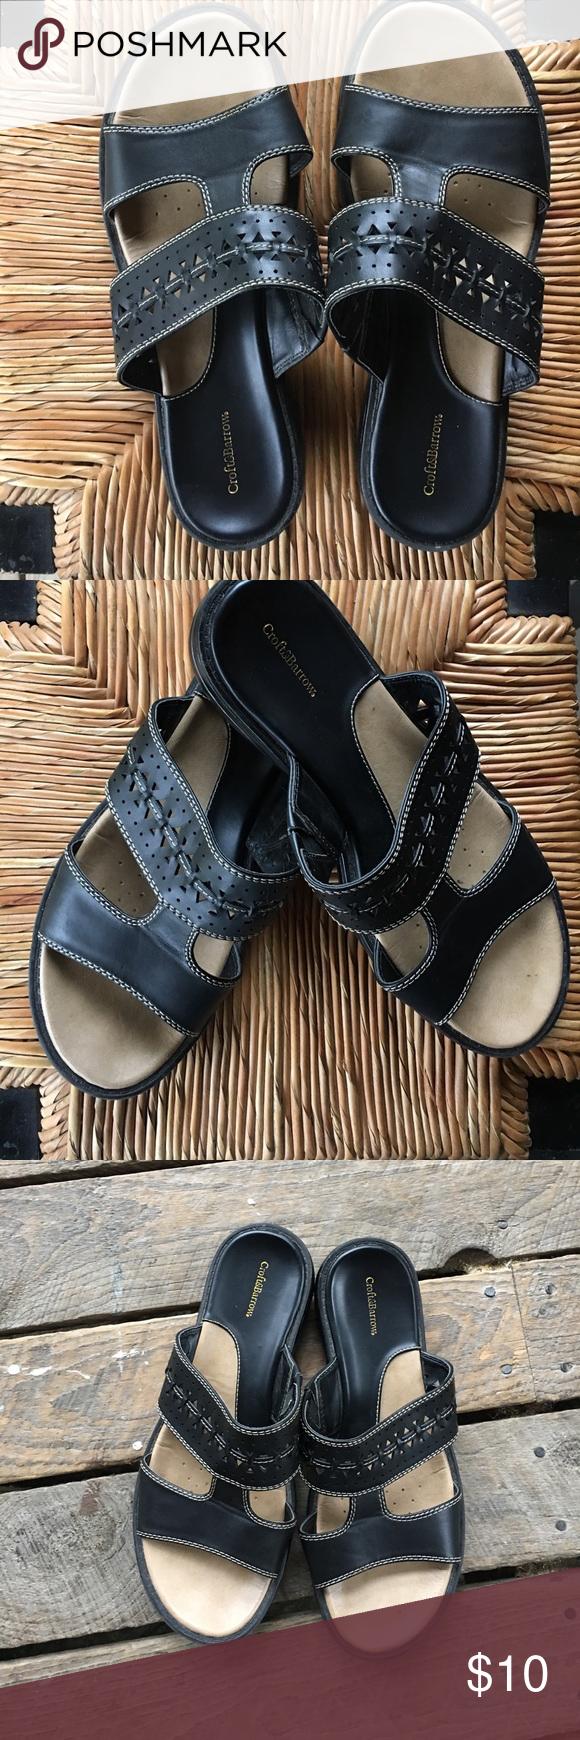 Croft u Barrow Sandals Size   Barrow AFC Shoes sandals and